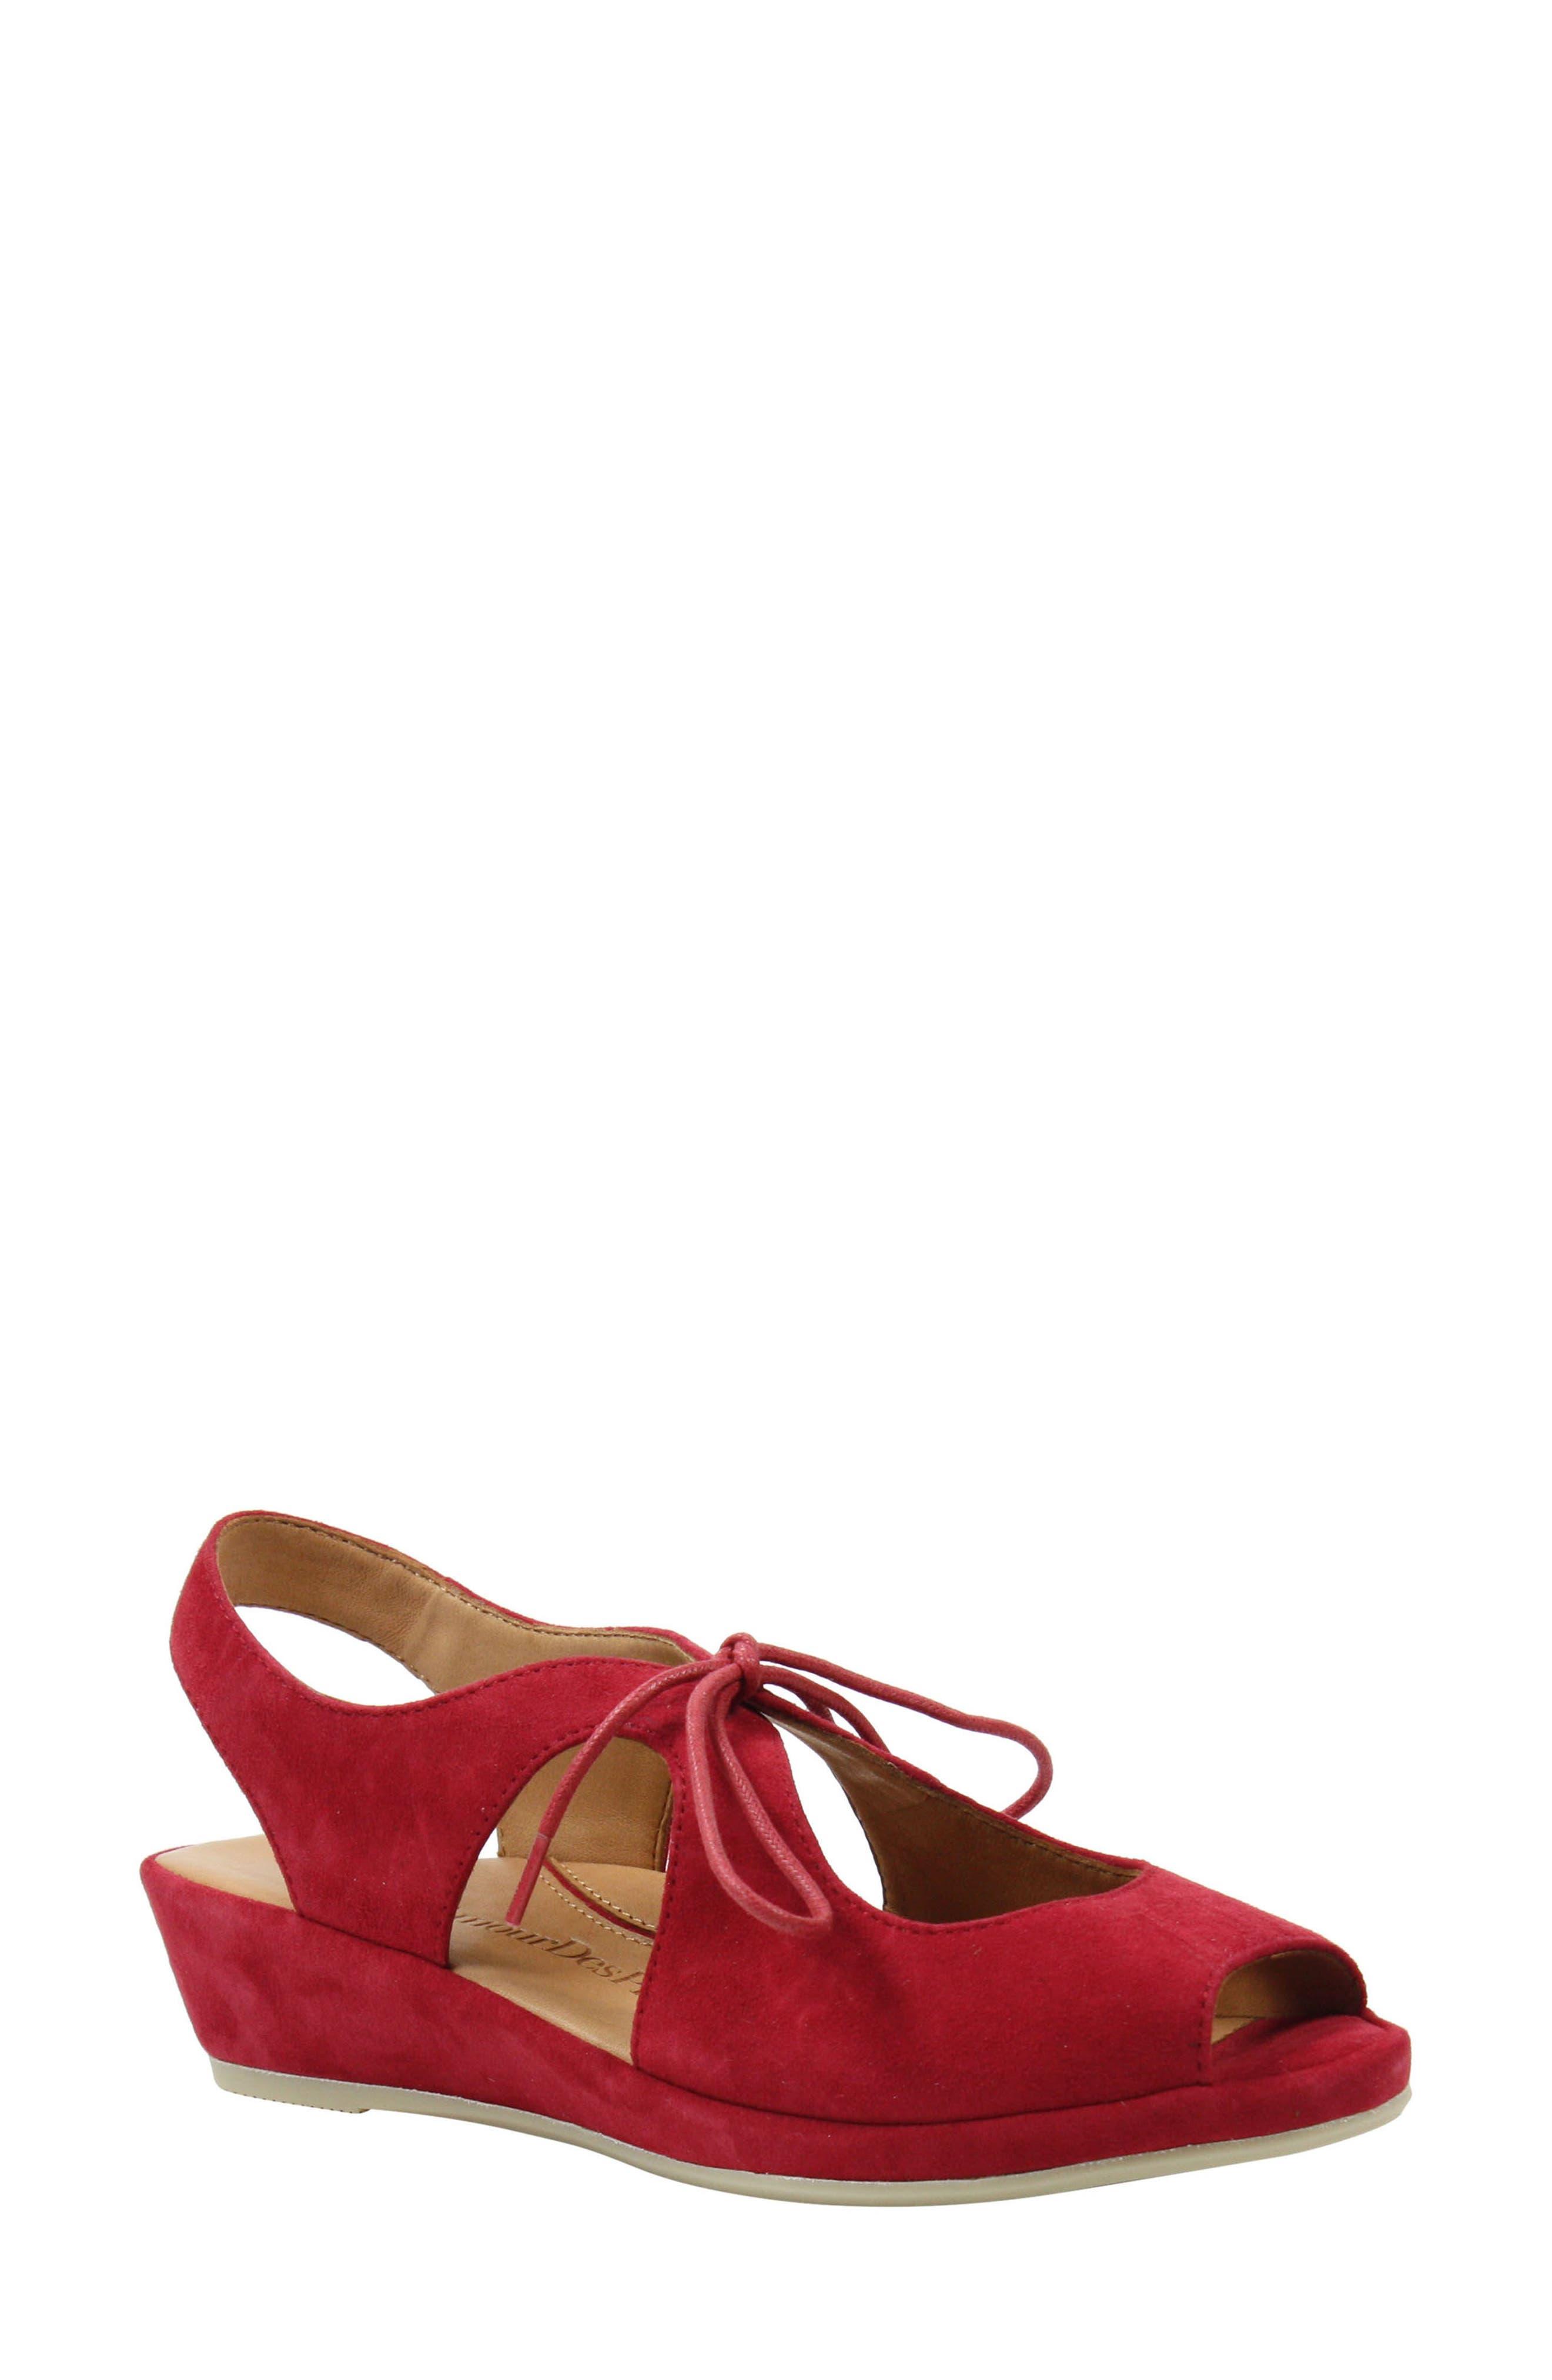 Vintage Sandal History: Retro 1920s to 1970s Sandals Womens LAmour Des Pieds Brettany Sandal Size 8 M - Red $119.90 AT vintagedancer.com